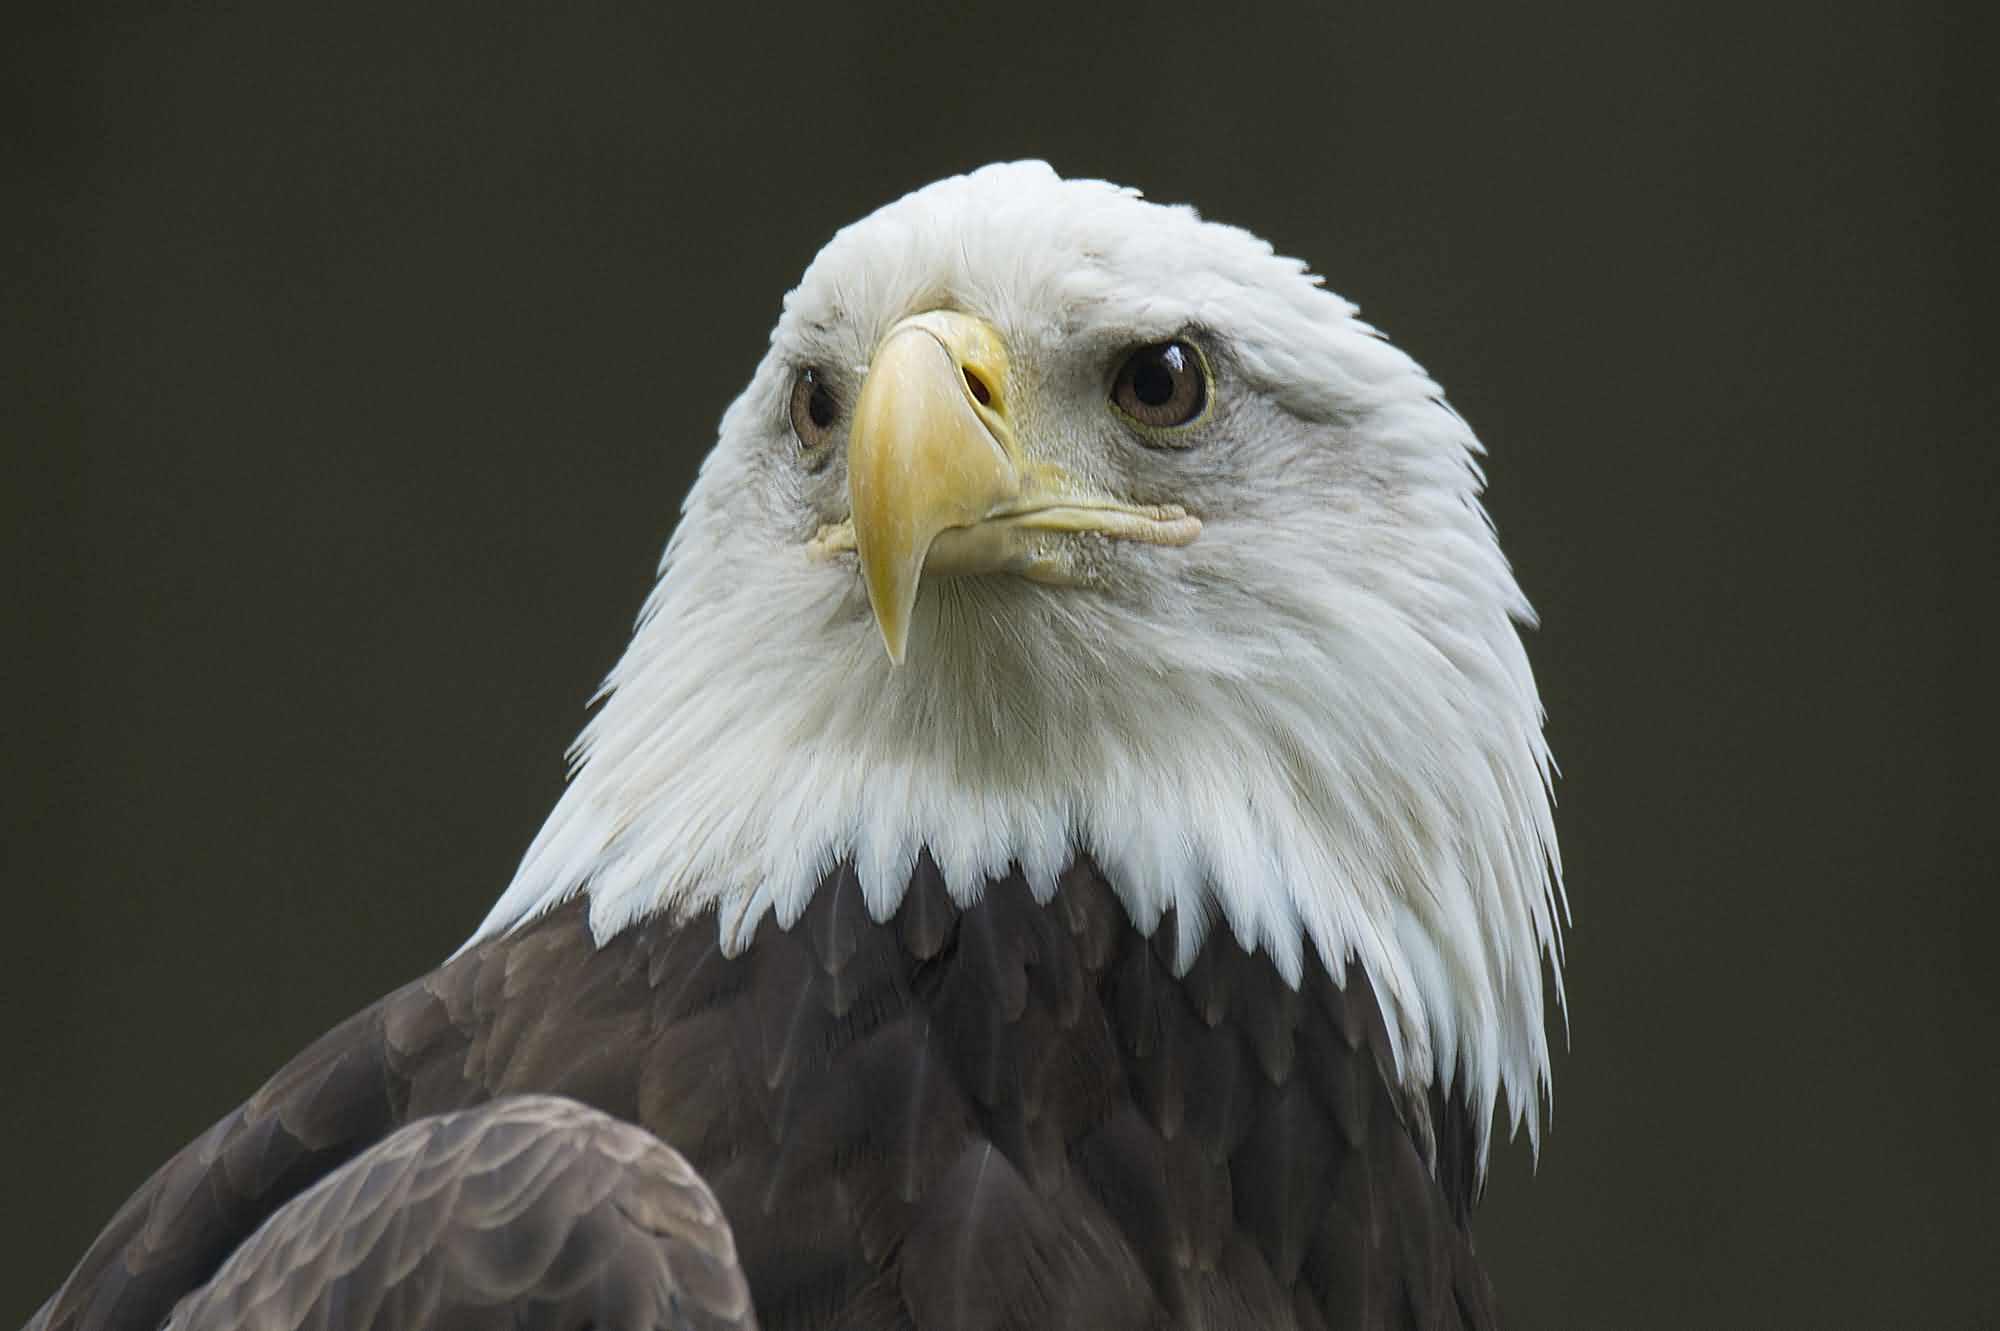 Happy American Eagle Day Hd Wallpaper